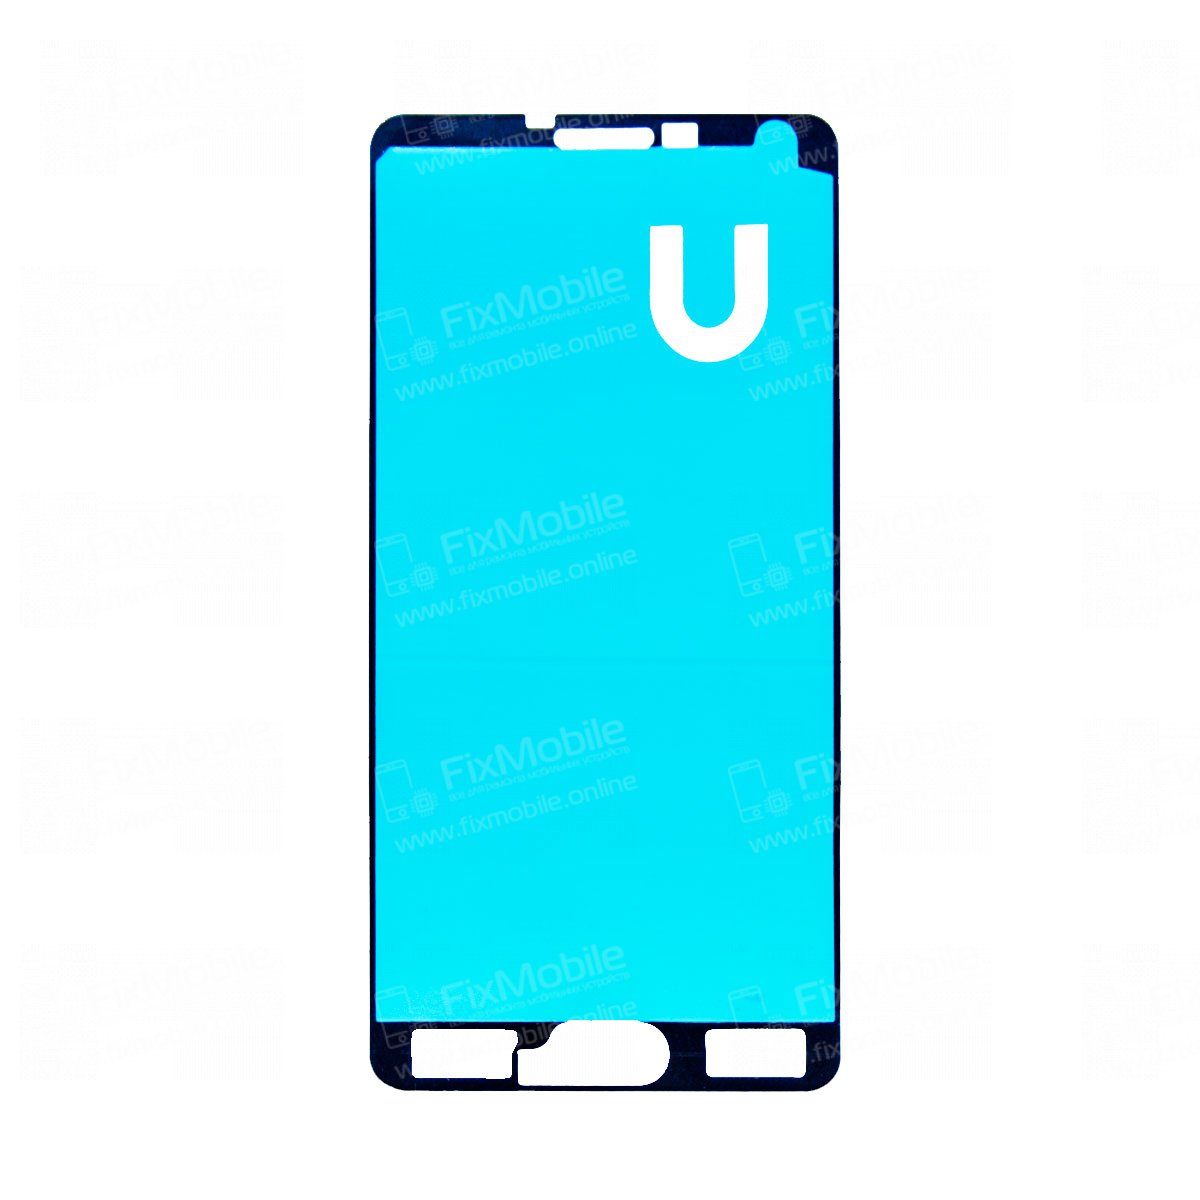 Скотч для проклейки дисплейного модуля Samsung Galaxy A7 (A700FD)